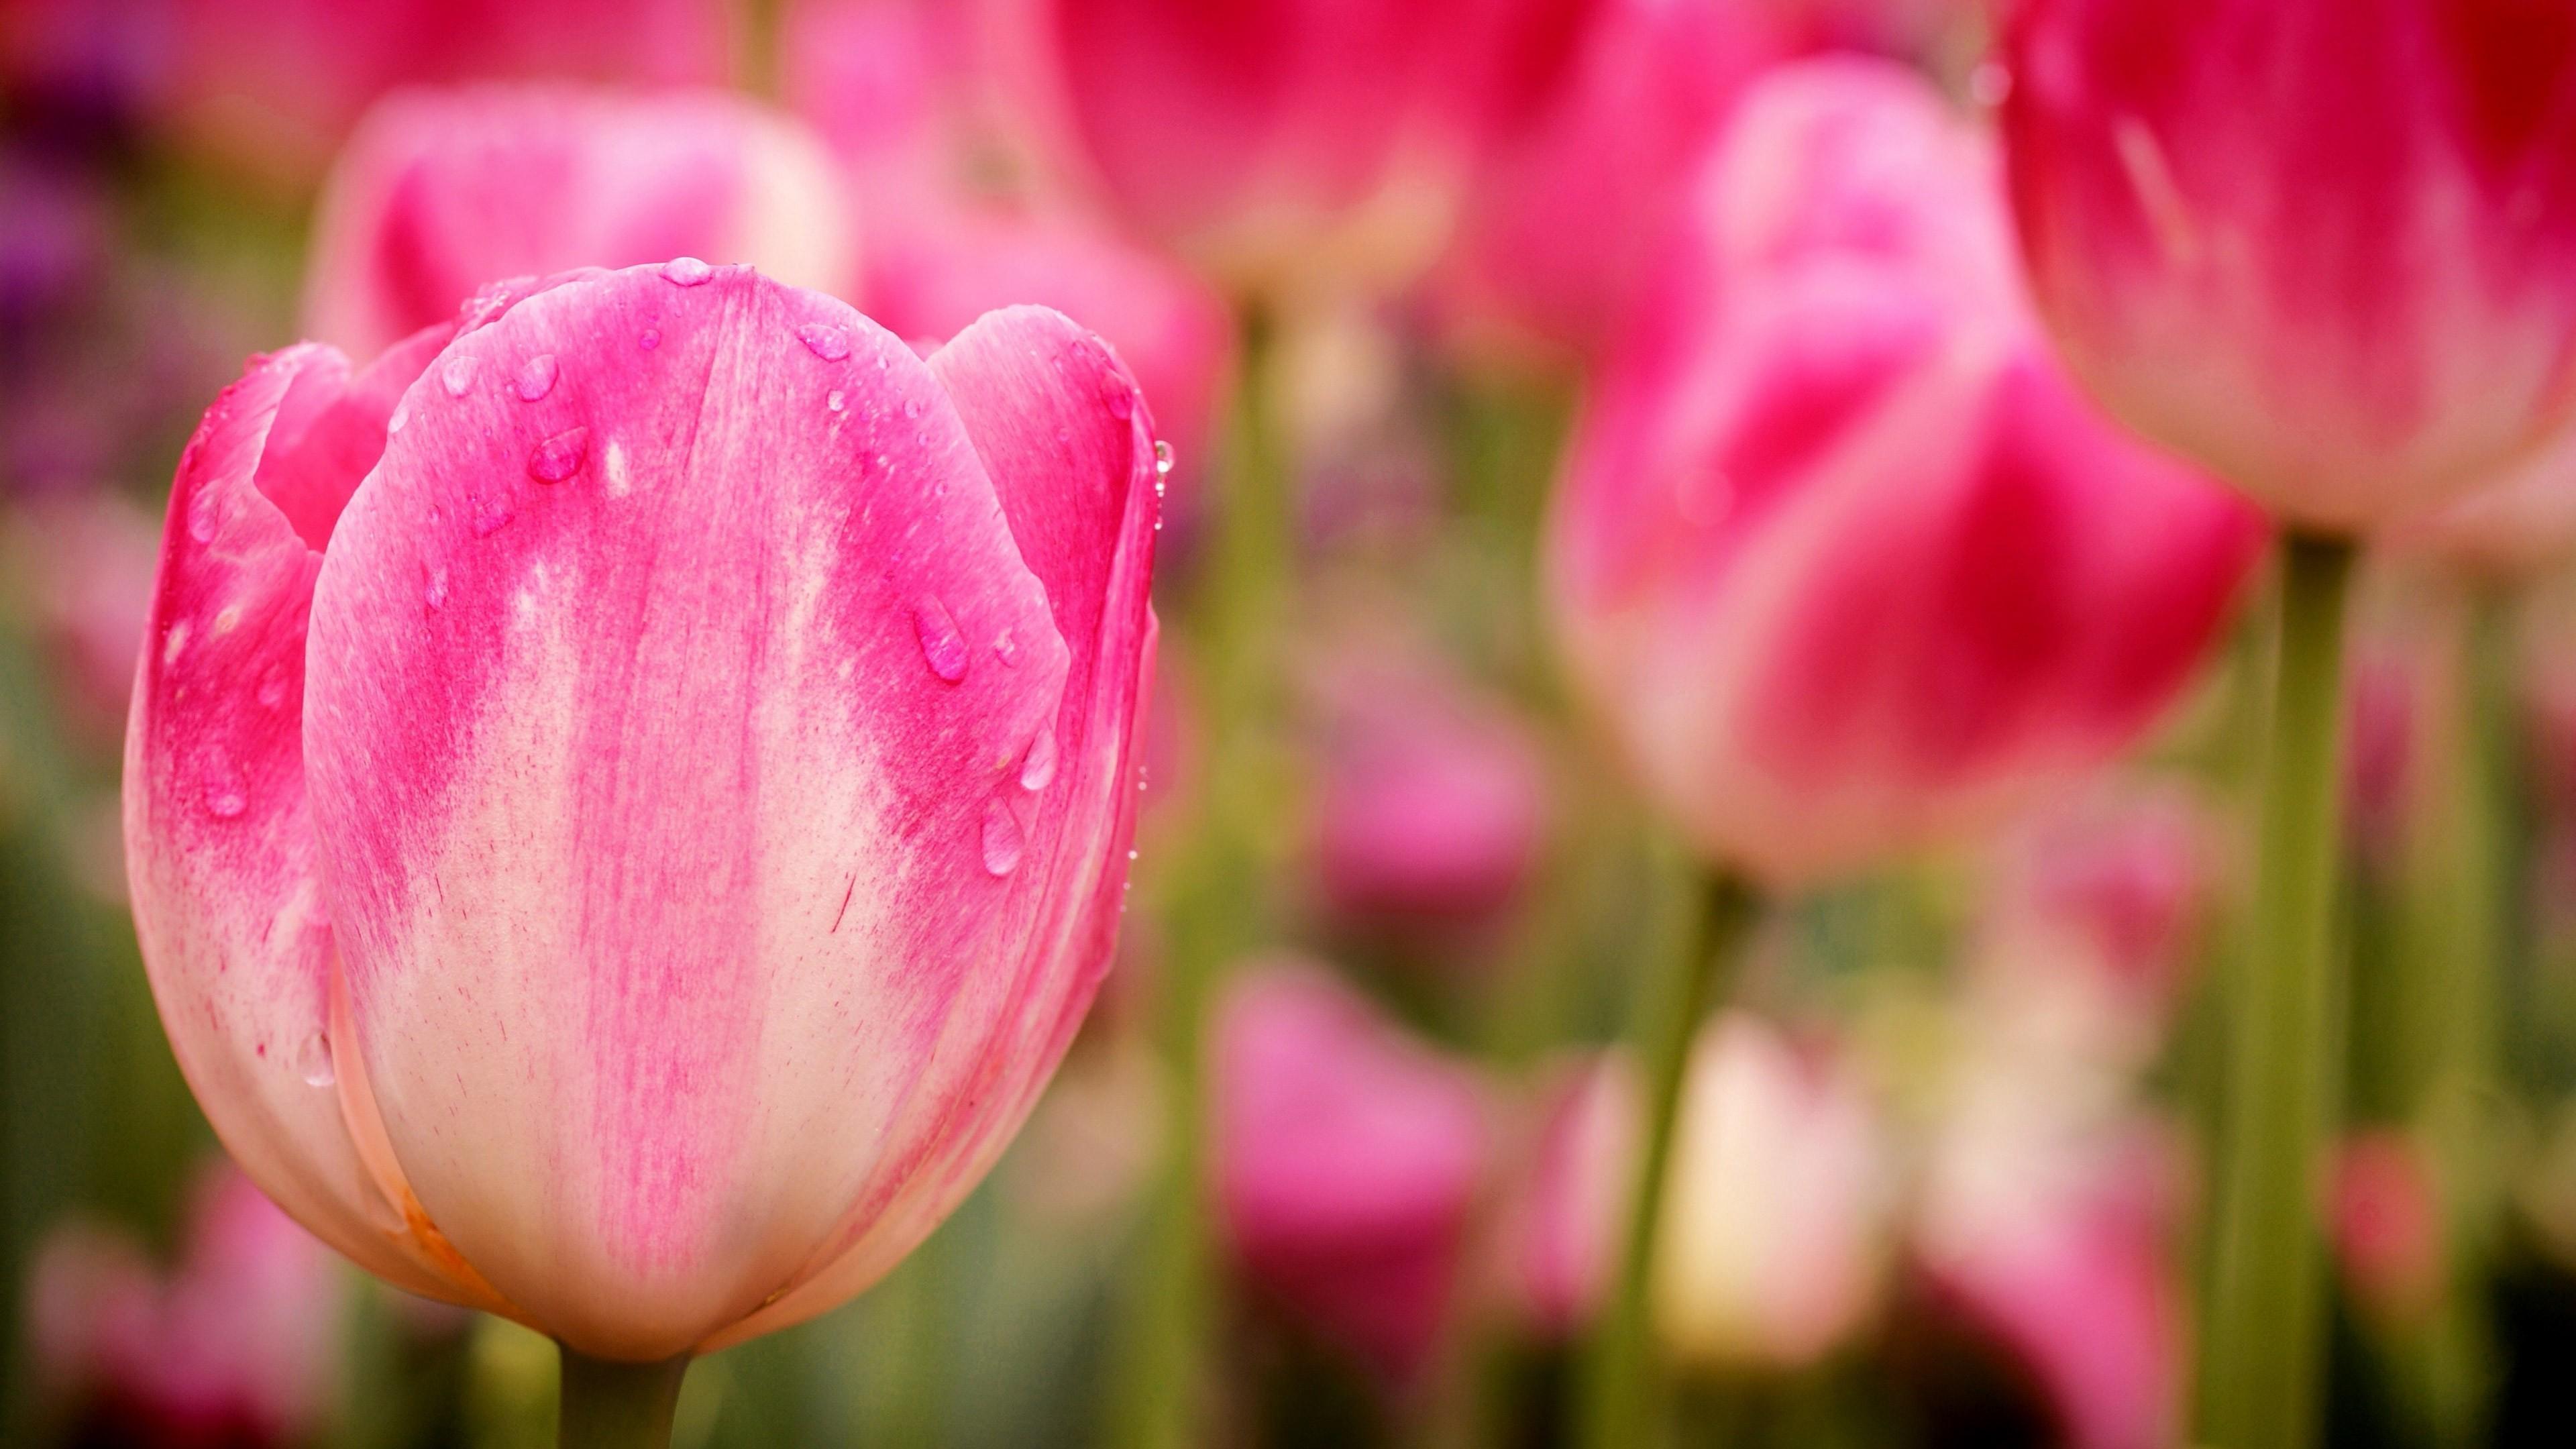 Wallpaper Tulips 5k 4k Wallpaper Flowers Macro Pink